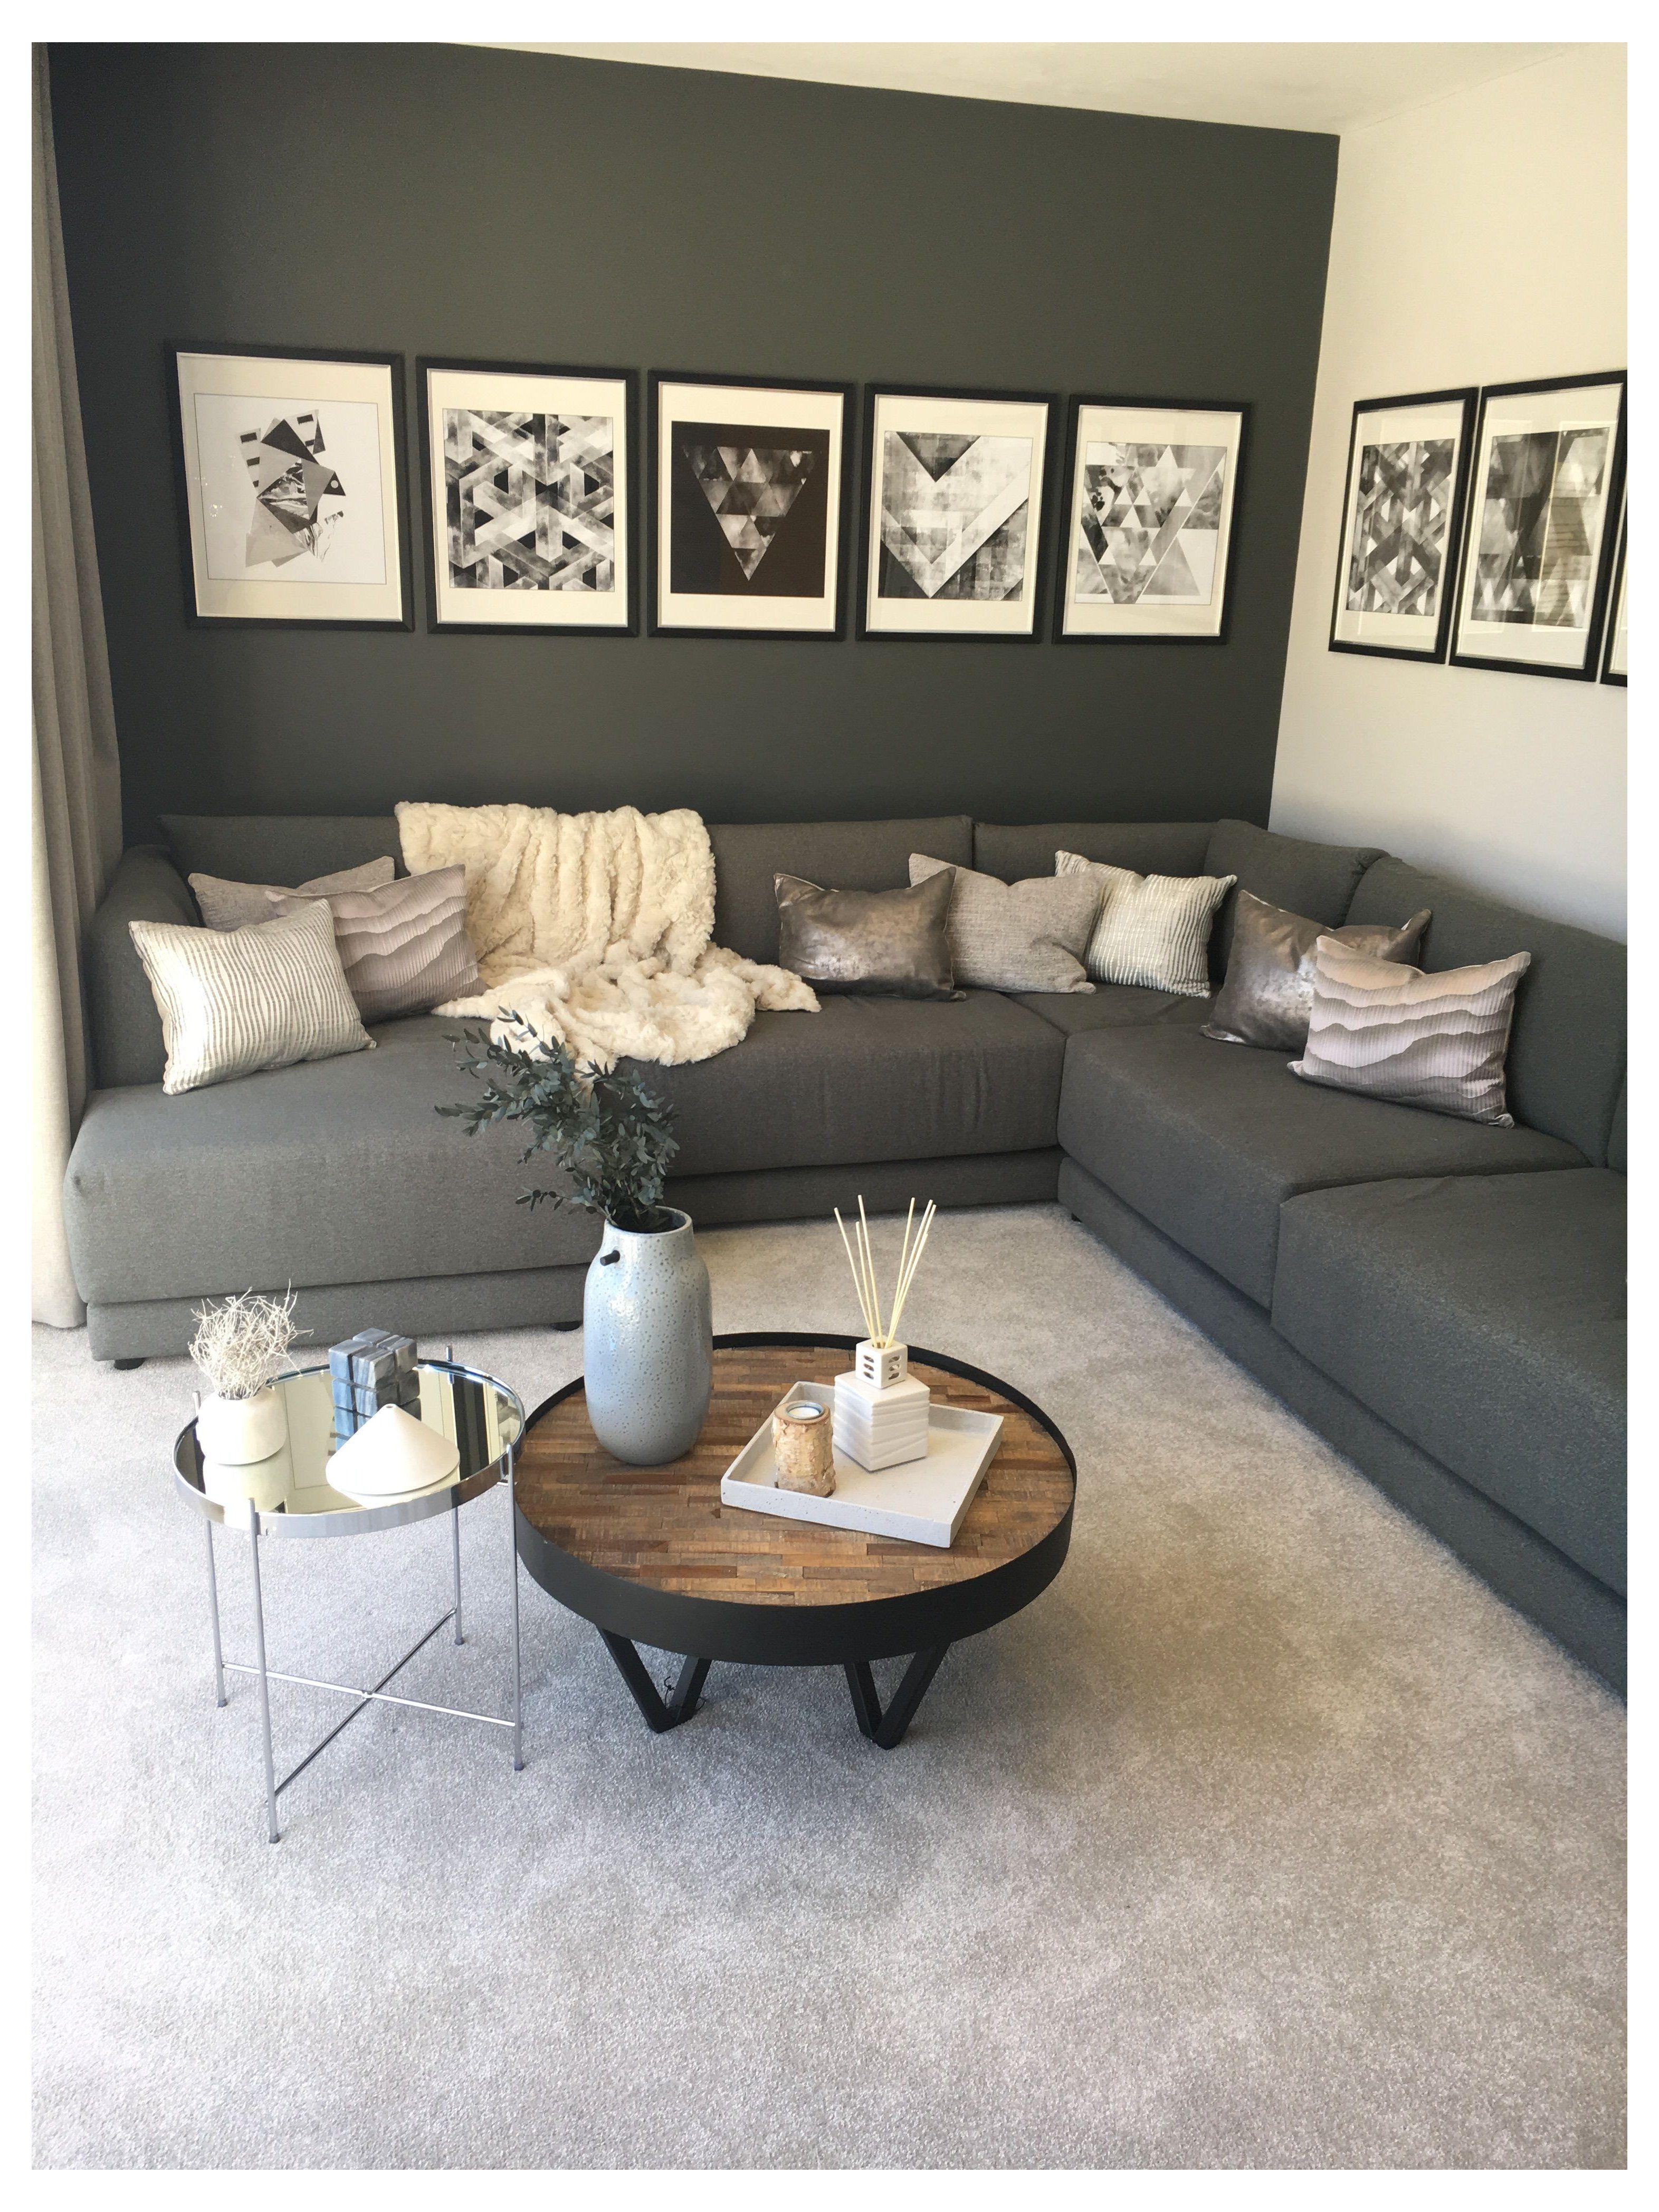 Strata Intrigue Lounge Decor Grey Walls A Dark Grey Contrast Wall And Statement Grey Sofa In 2021 Grey Sofa Living Room Black Living Room Living Room Decor Gray Gray couch living room colors